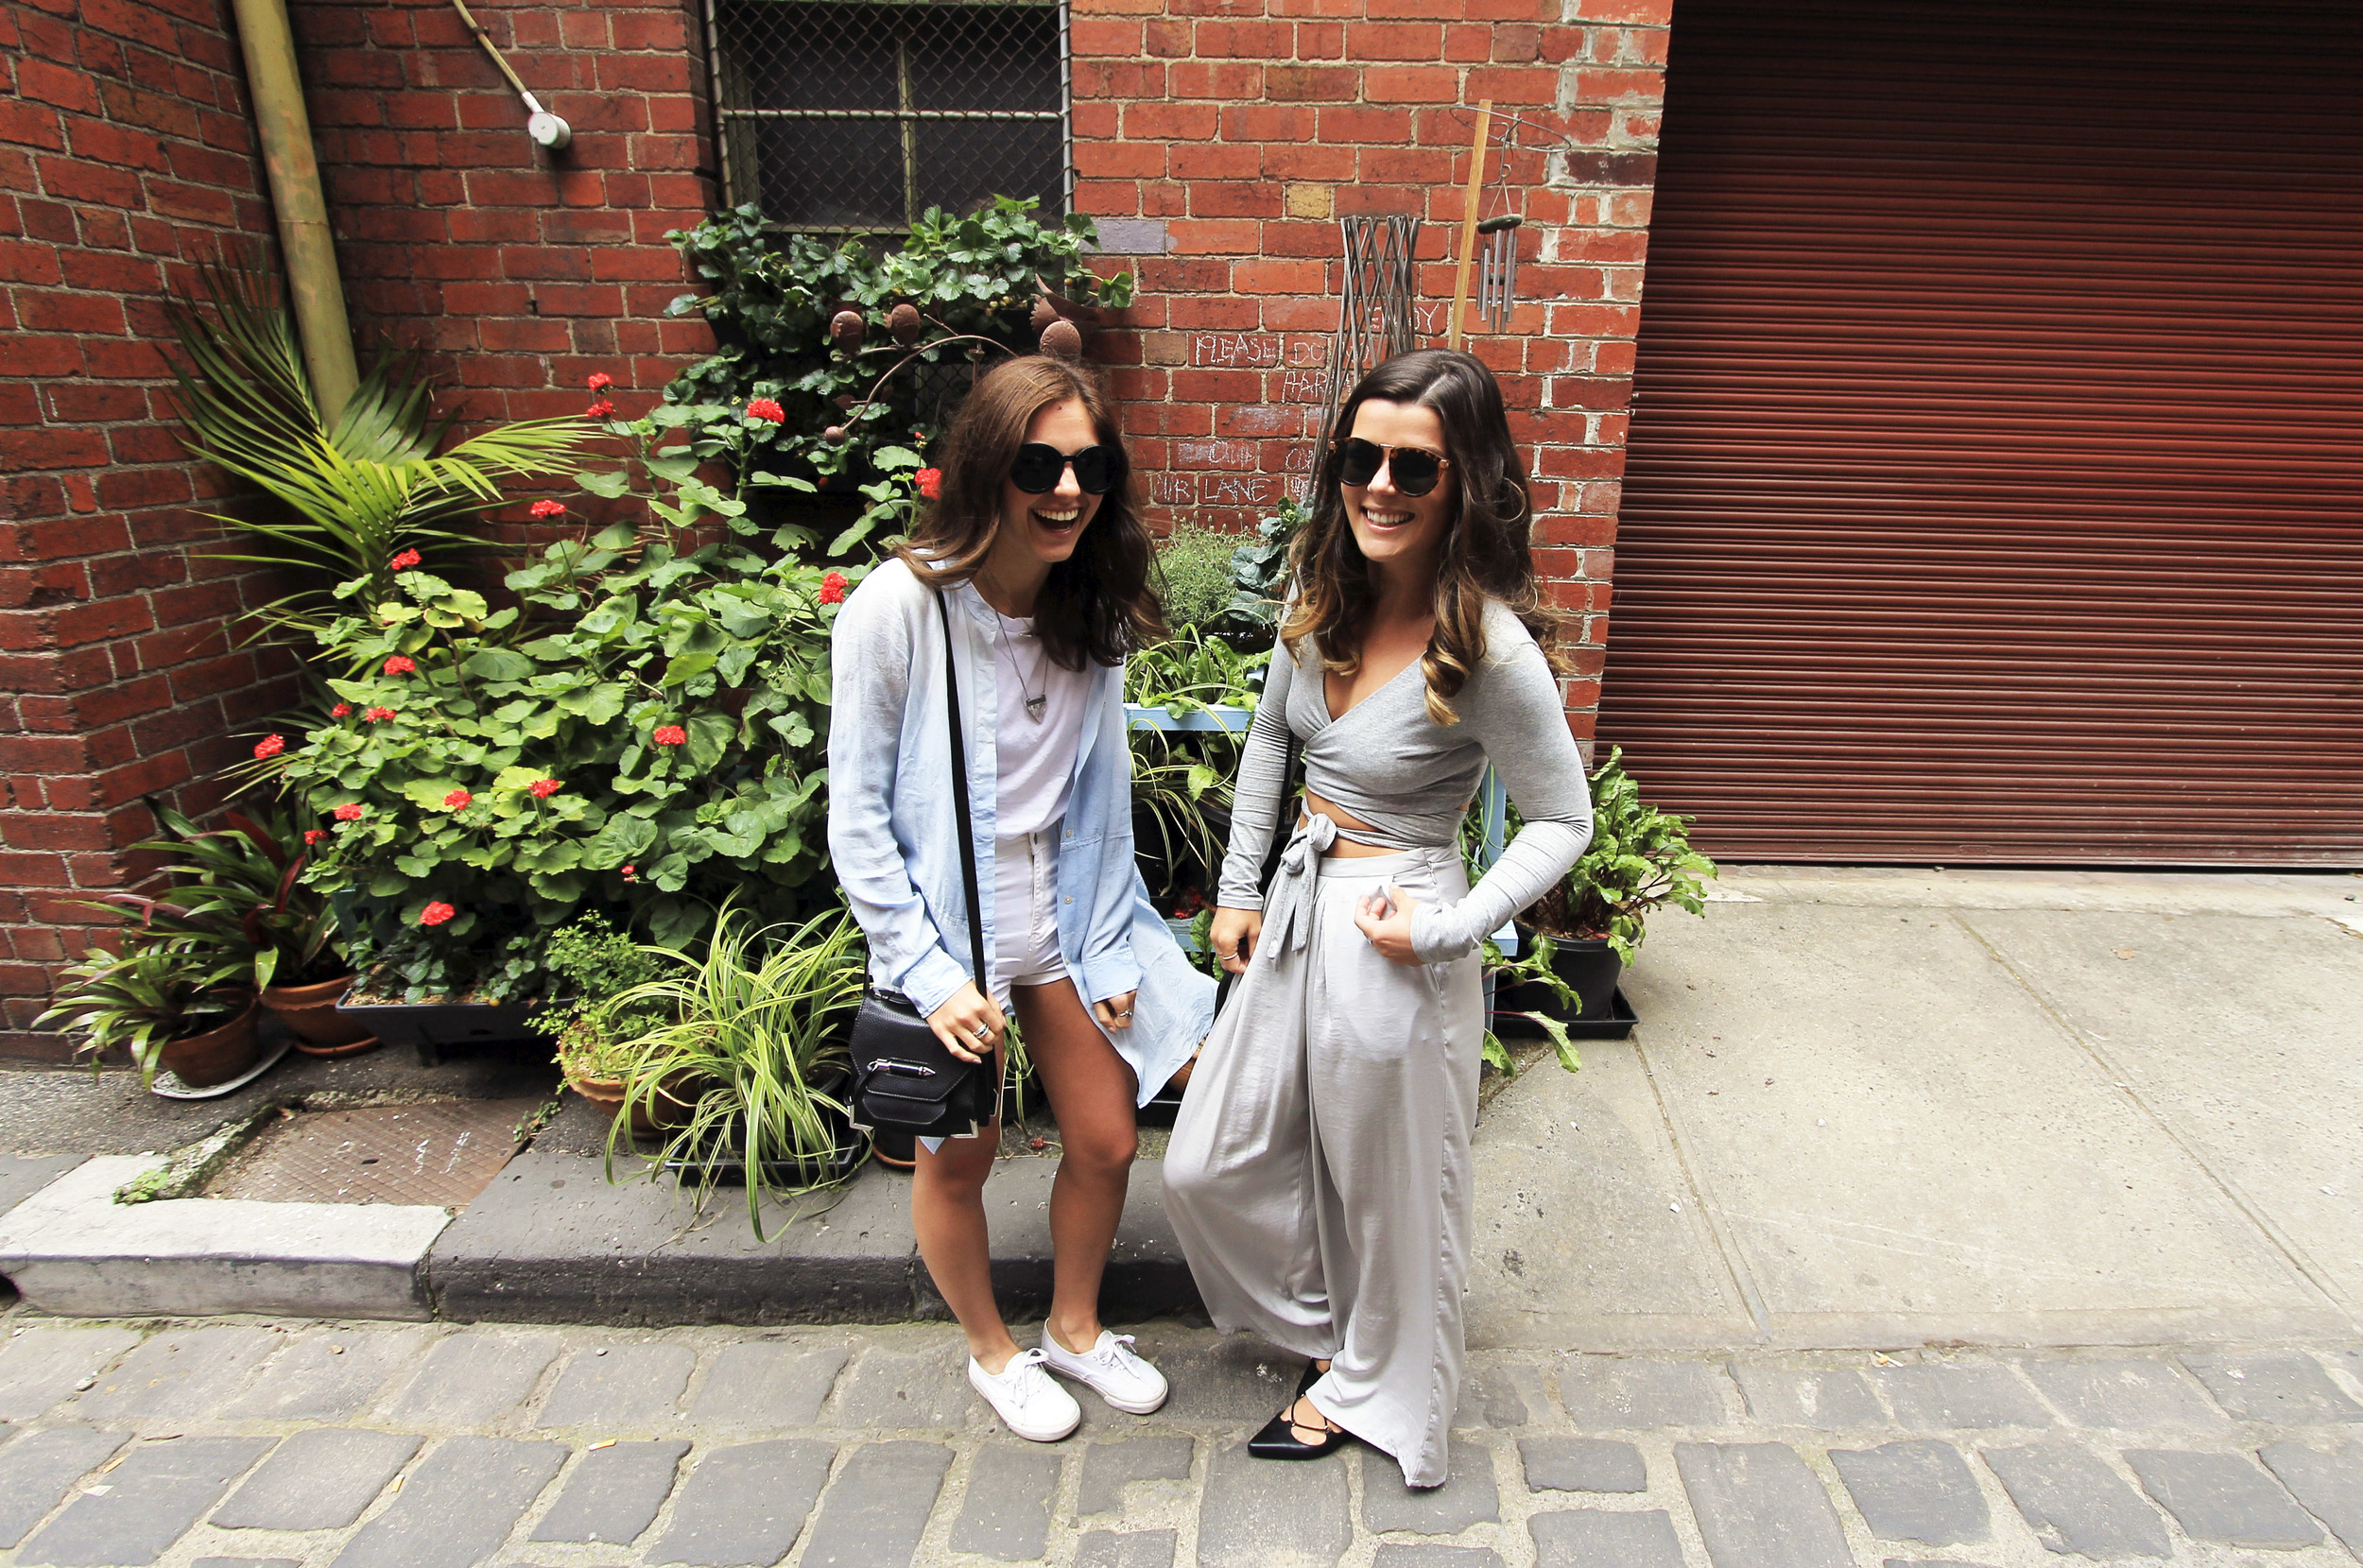 aritzia-pale-blue-bossut-outfit-style-white-vans-sneakers-shorts.jpg